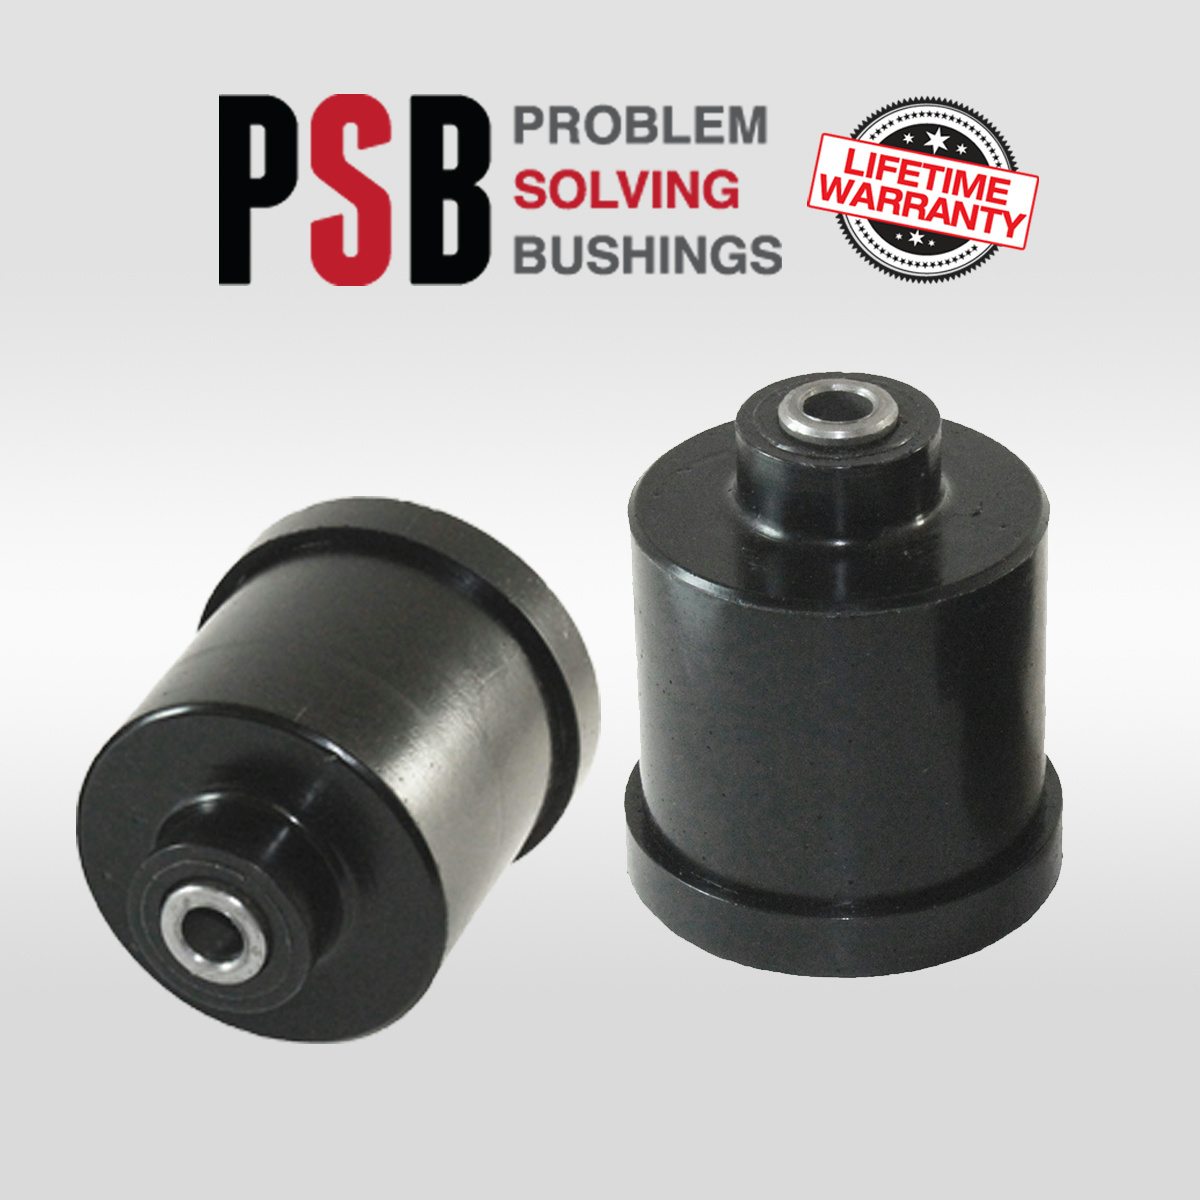 2x Vw Beetle 98 11 Rear Axle Beam Polyurethane Bushings